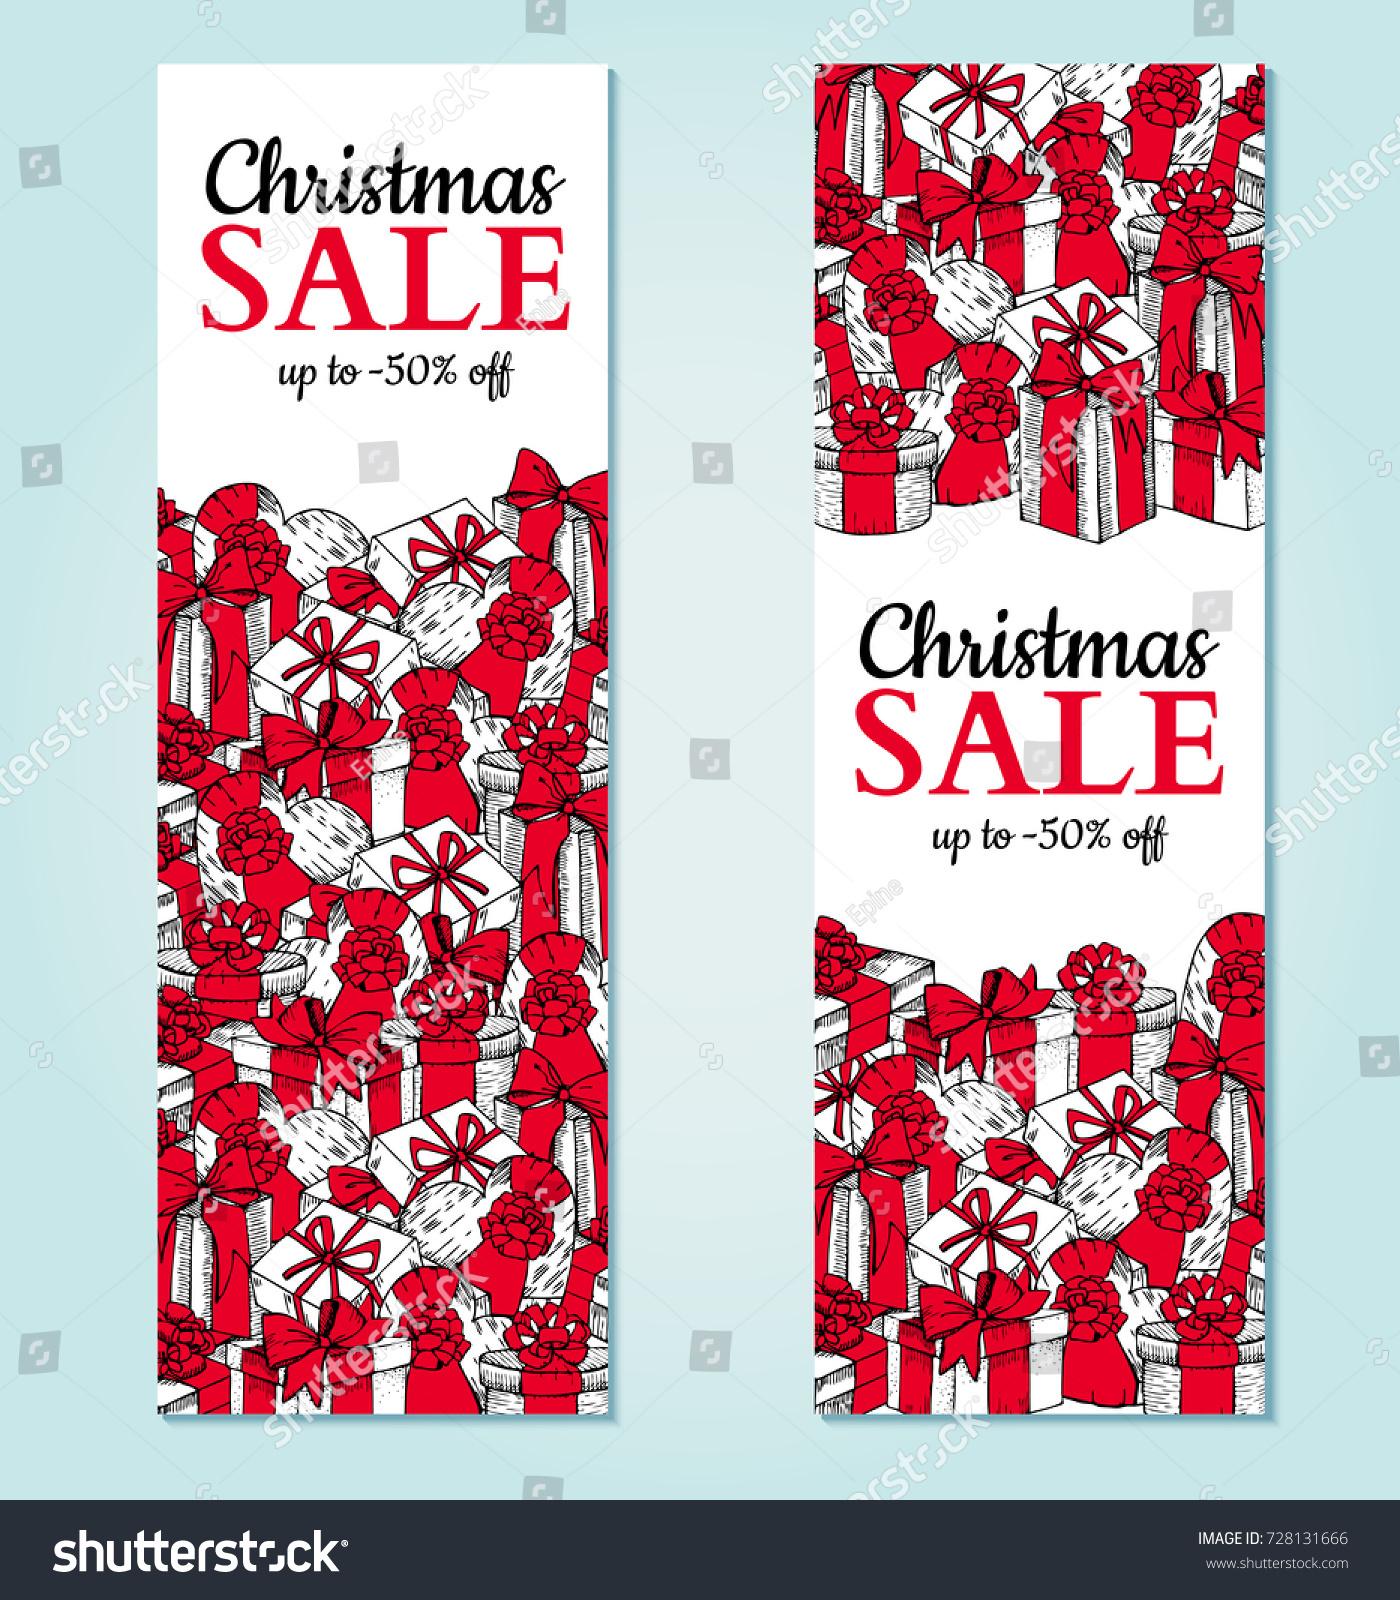 Christmas Sale Banner Vector Hand Drawn Stock Vector 728131666 ...